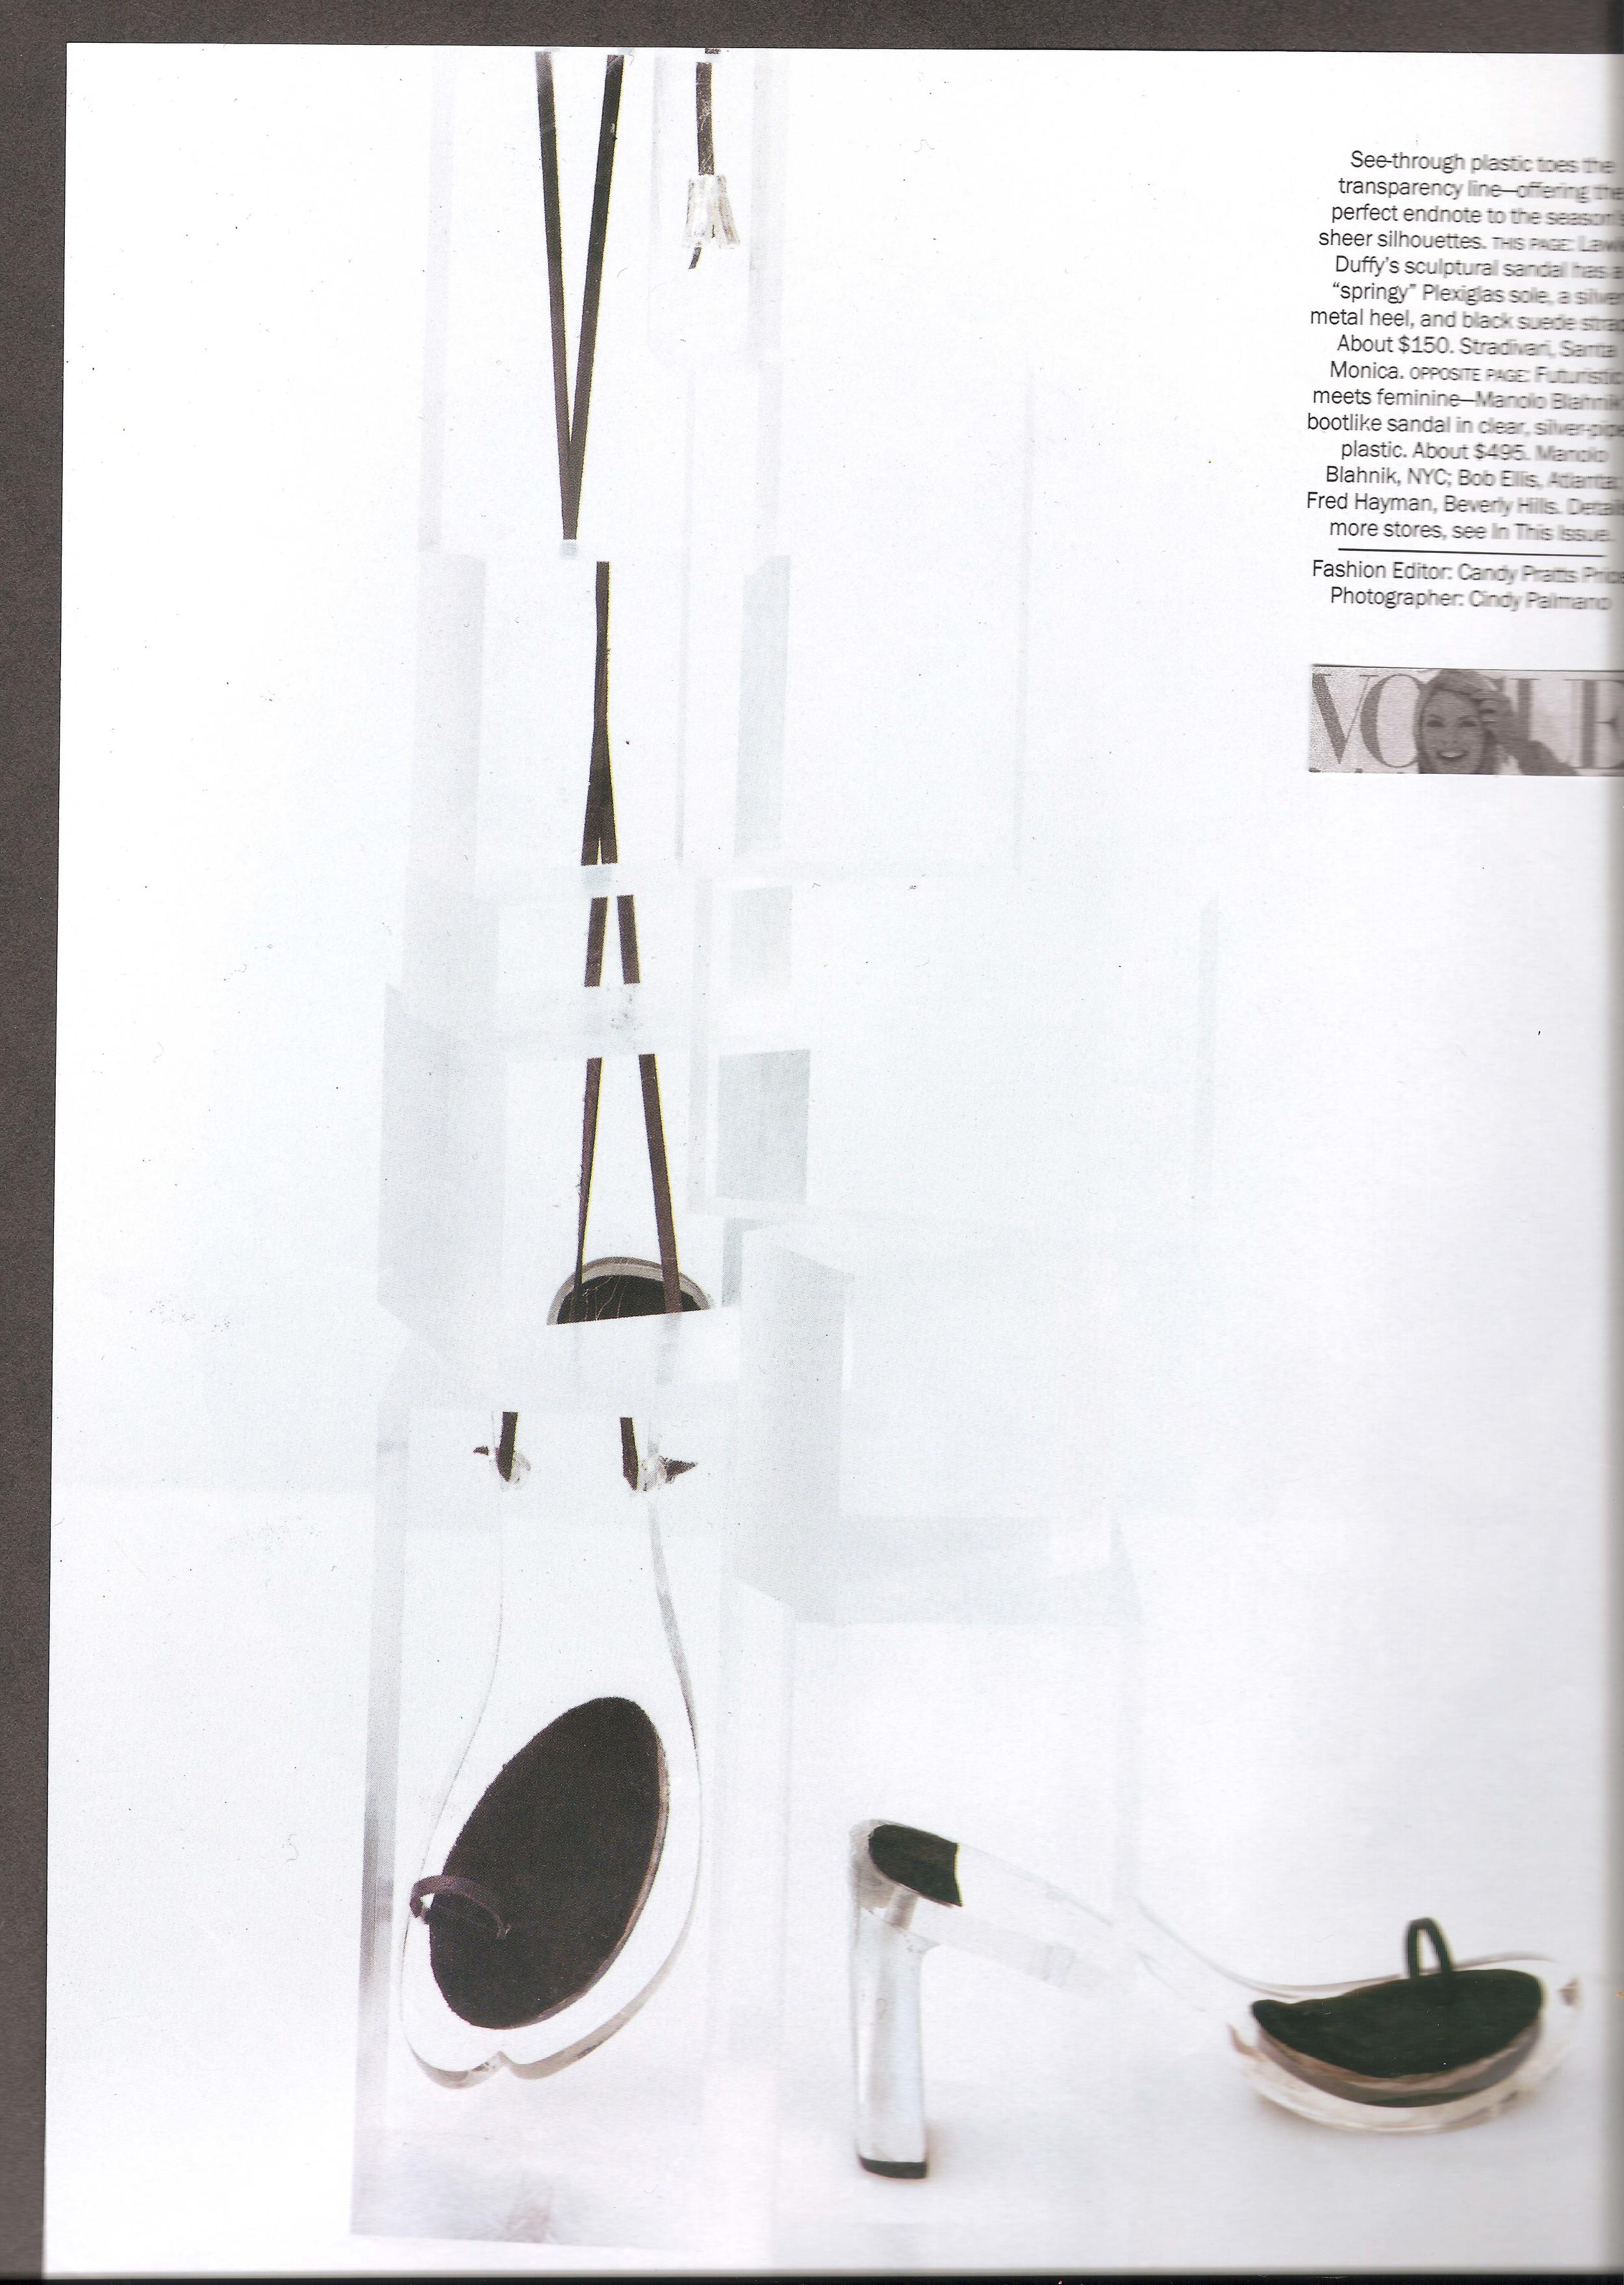 Vogue USA perspex.jpg